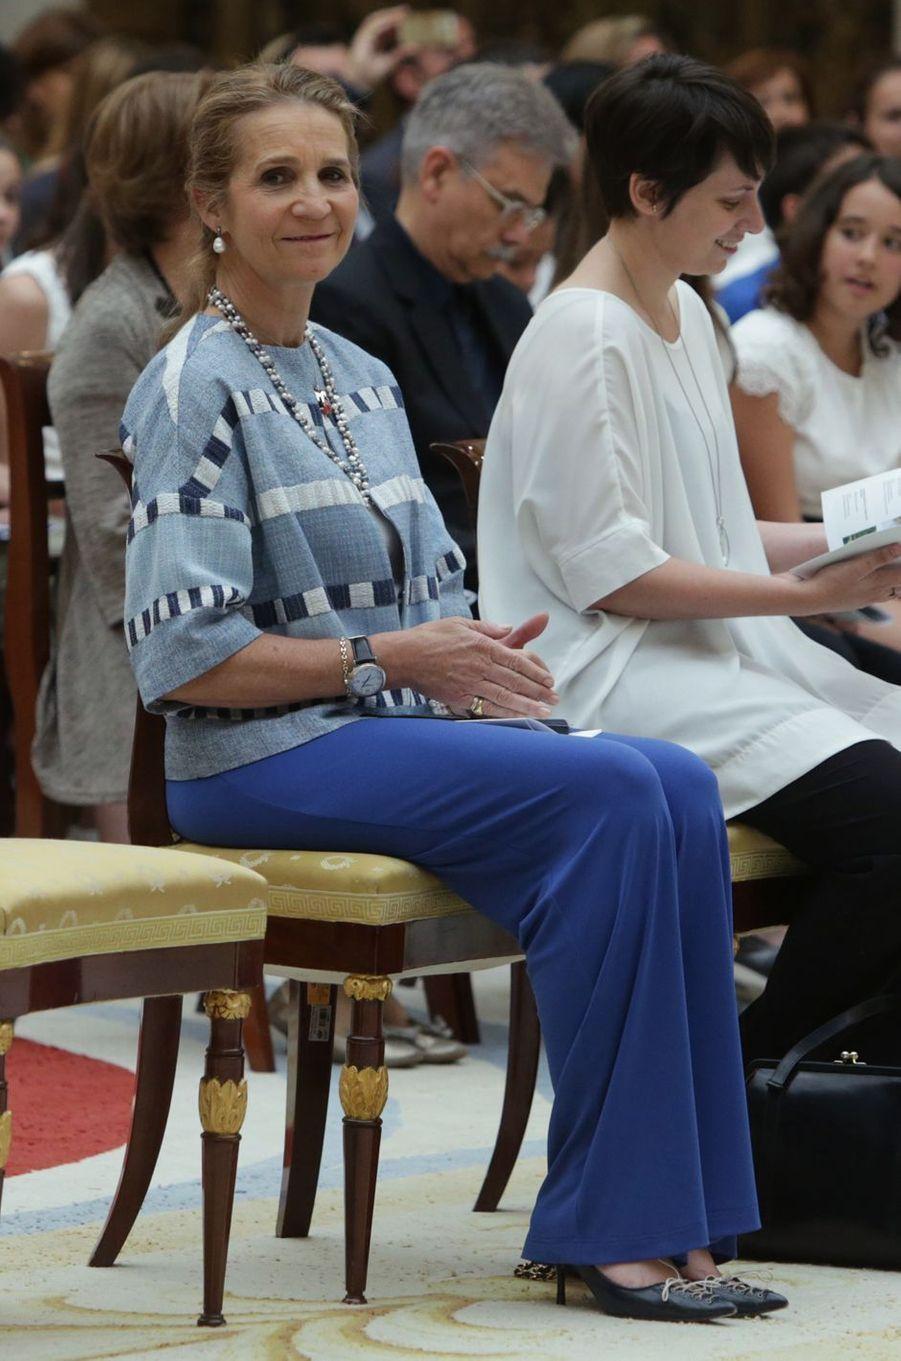 La princesse Elena d'Espagne, soeur du roi Felipe VI, à Madrid, le 8 juin 2017